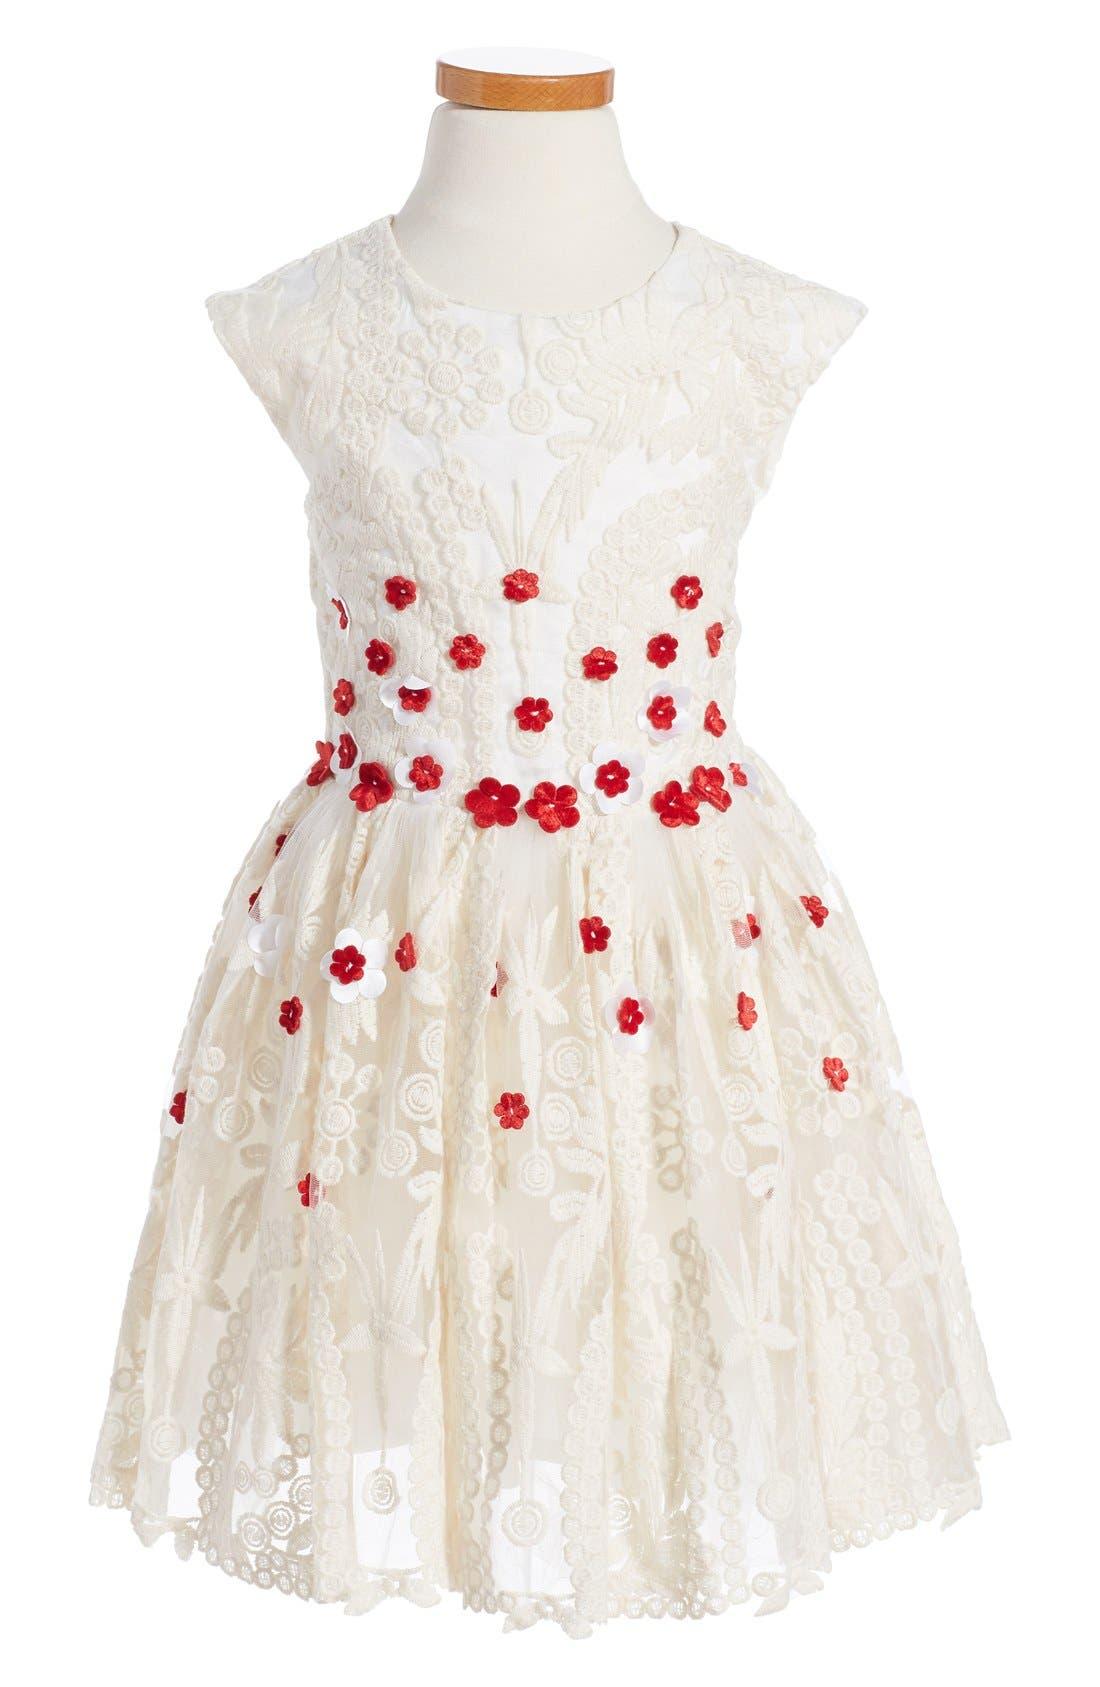 HALABALOO,                             Embroidered Flower Dress,                             Main thumbnail 1, color,                             900